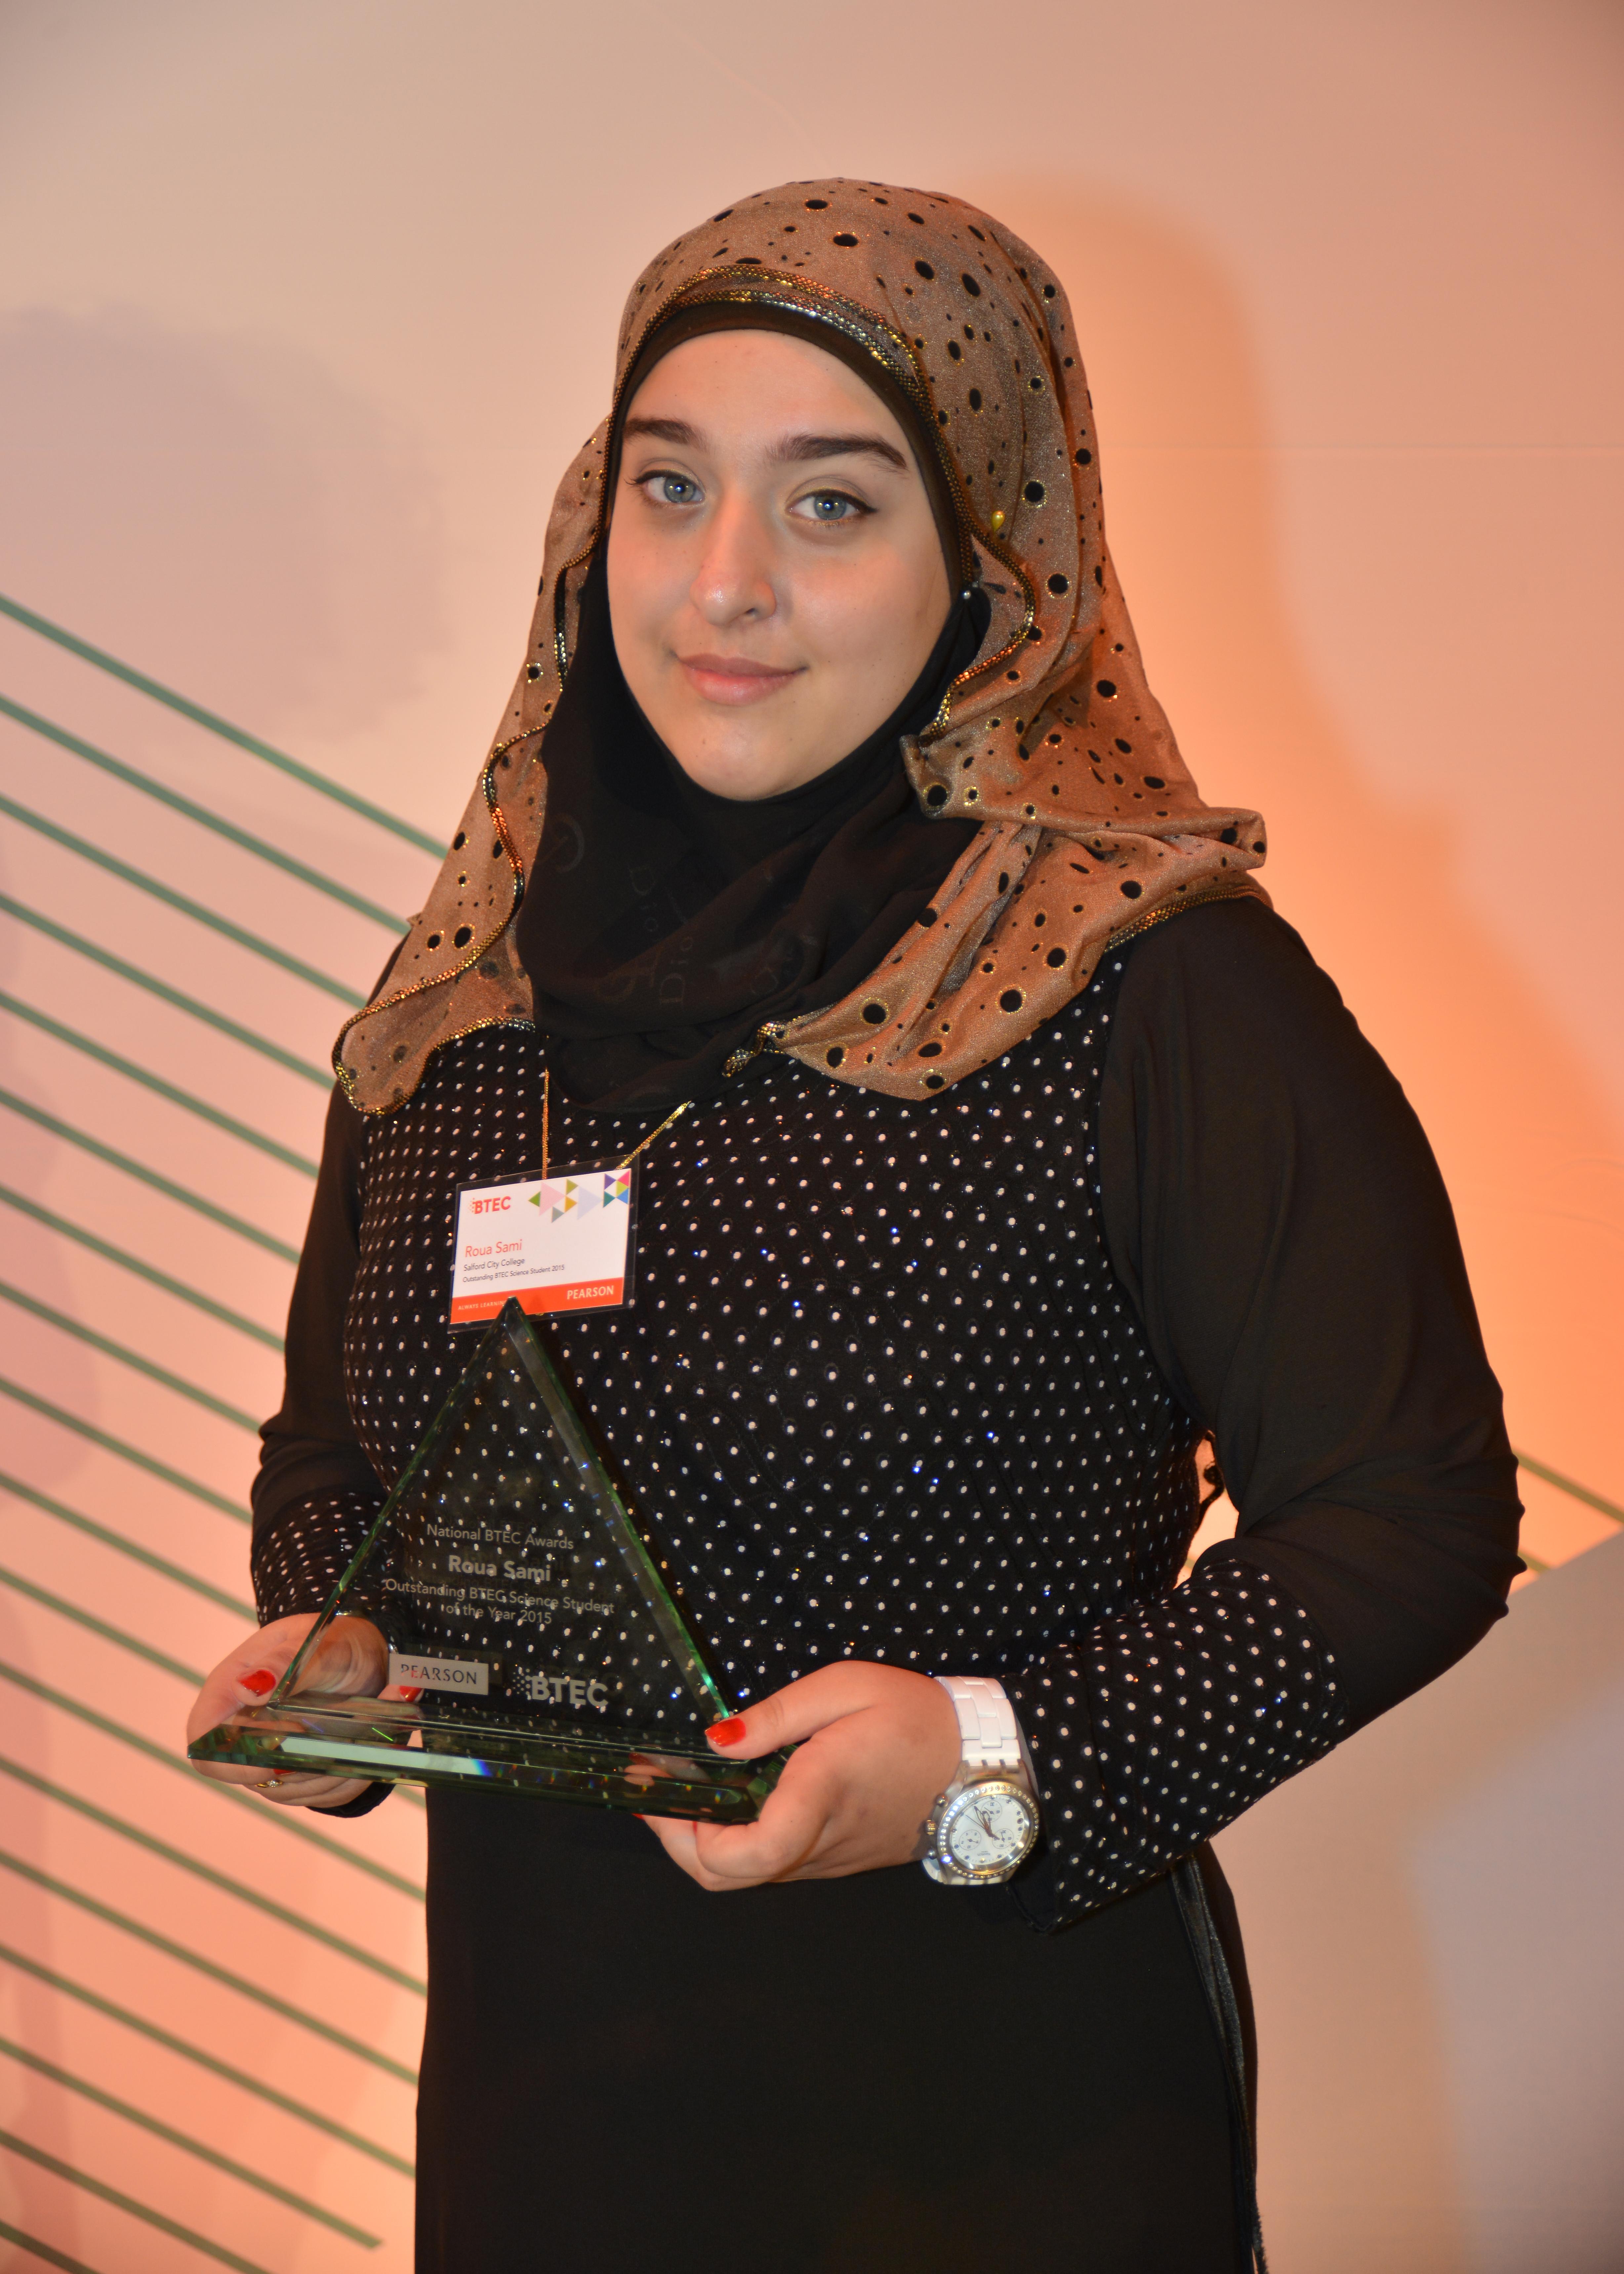 Roua Sami, aged 19, Salford City College